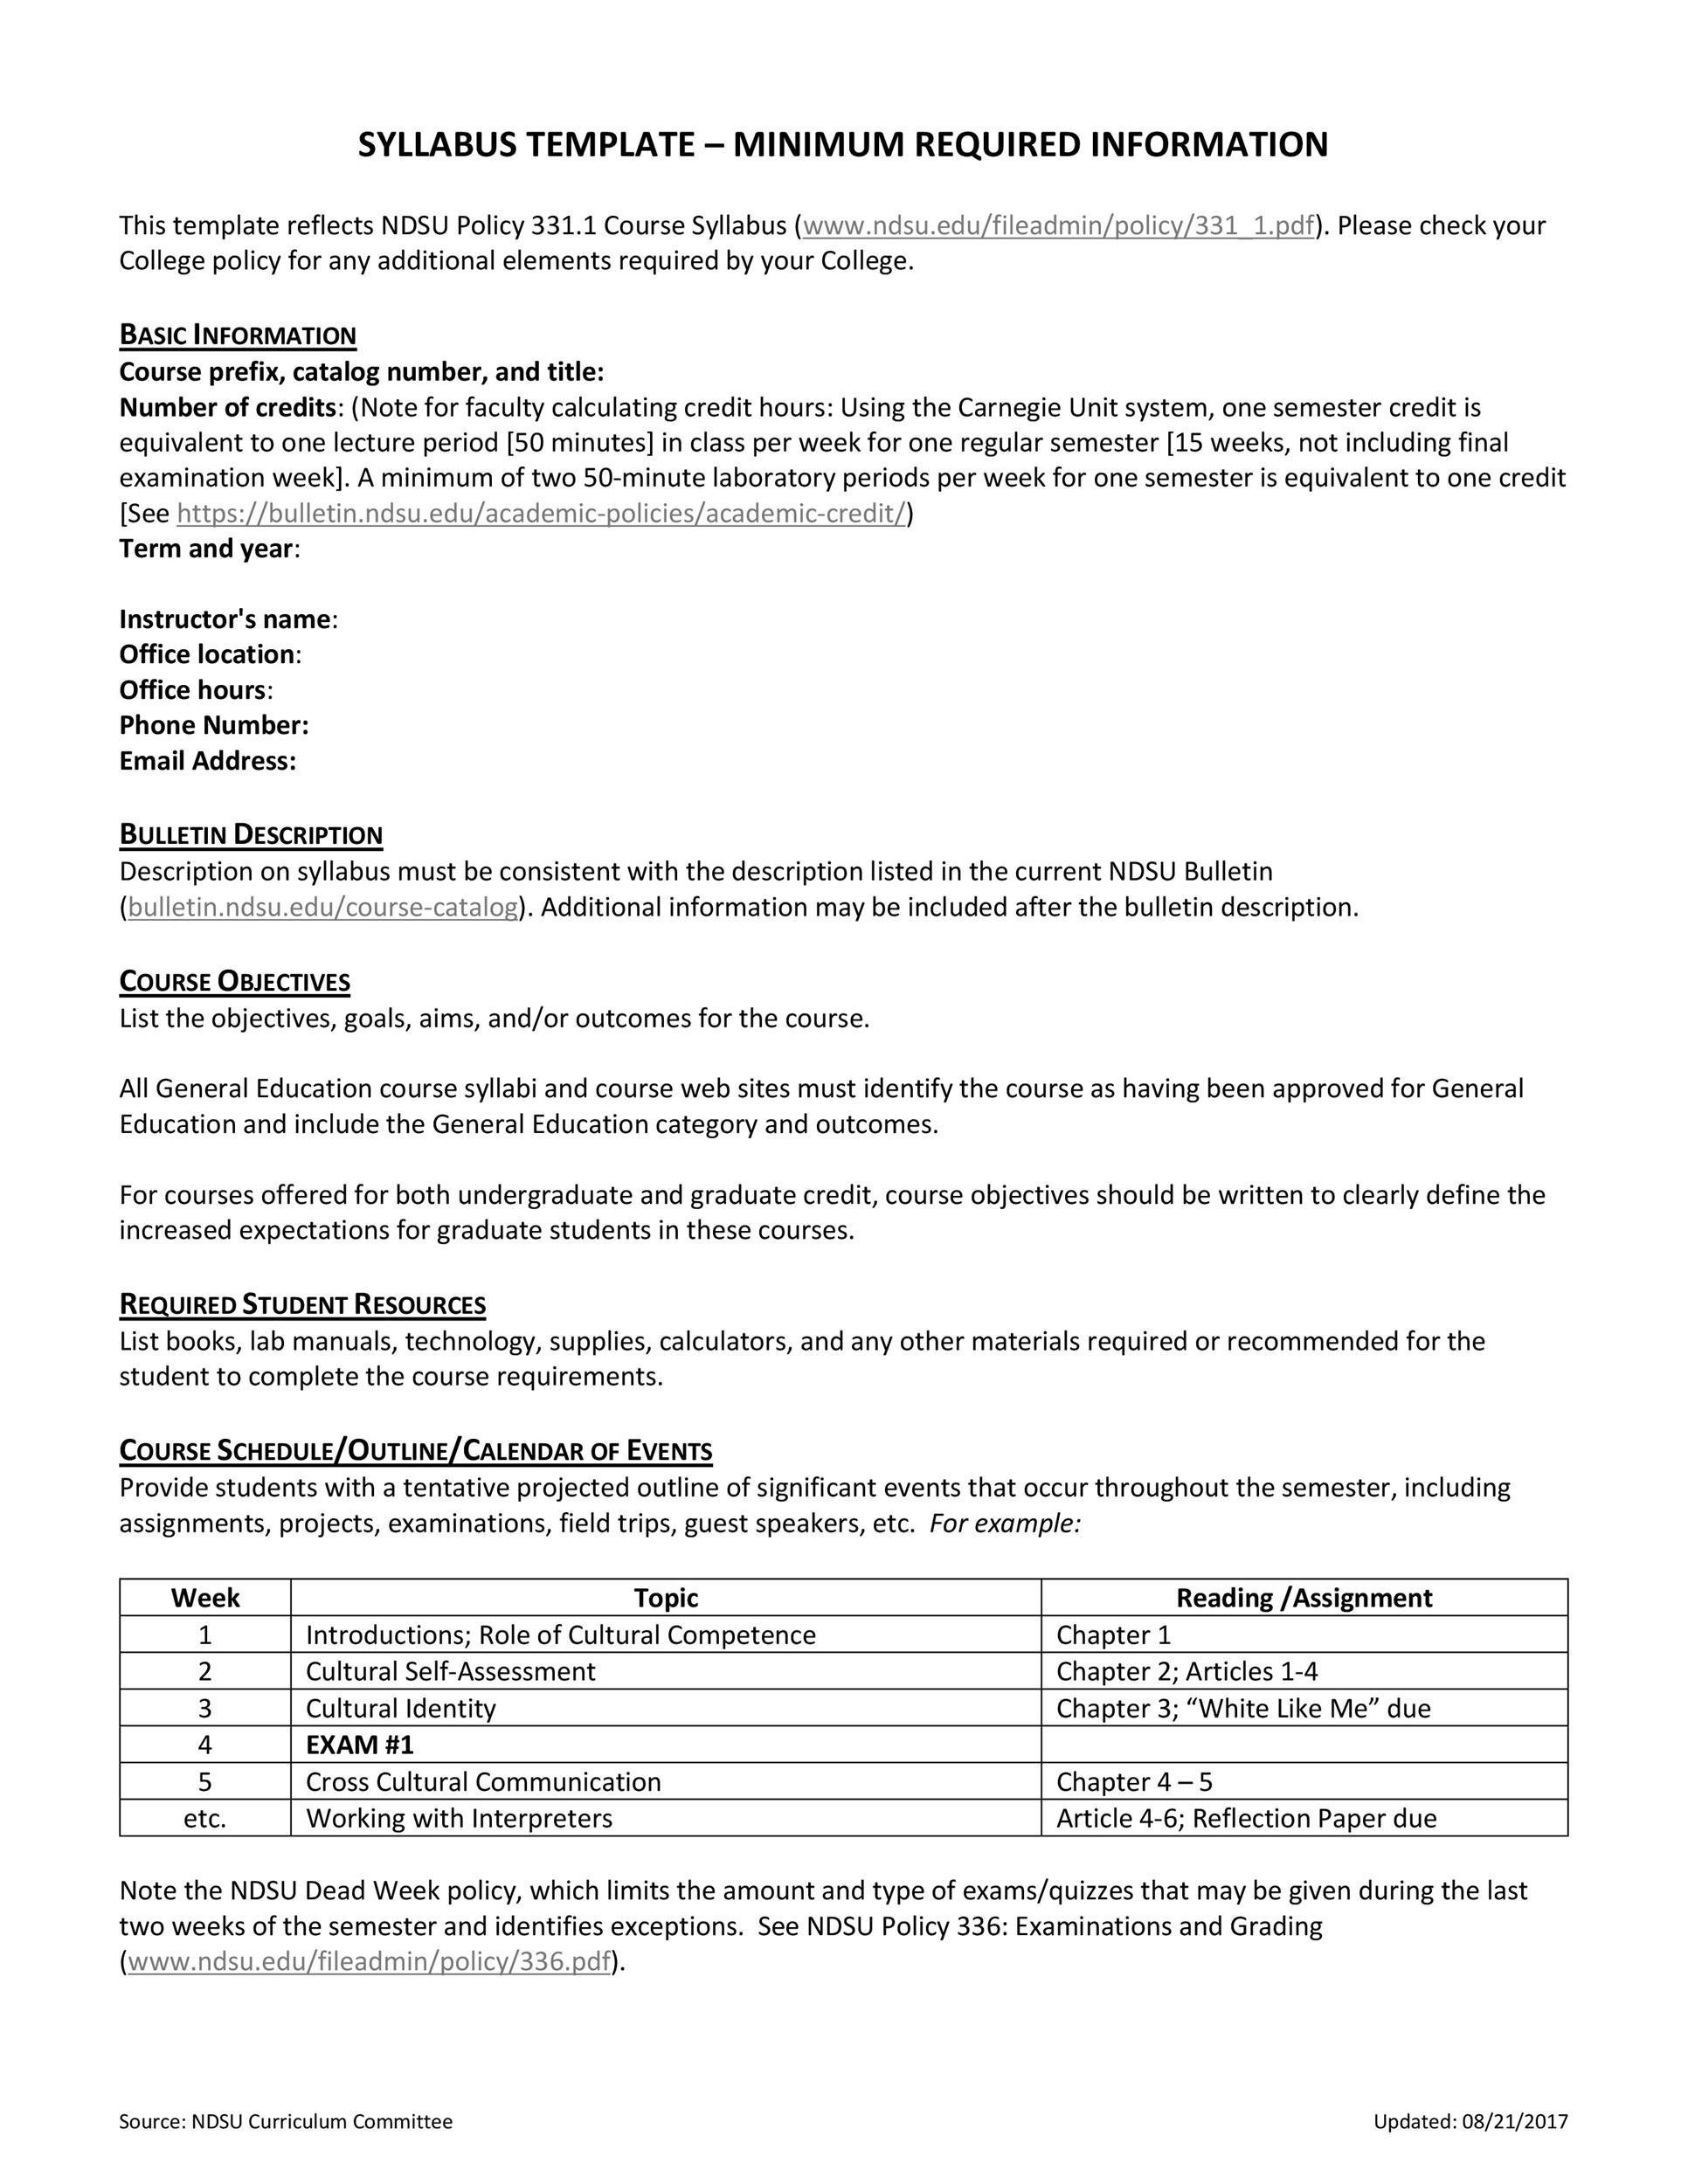 Free sylabus template 07